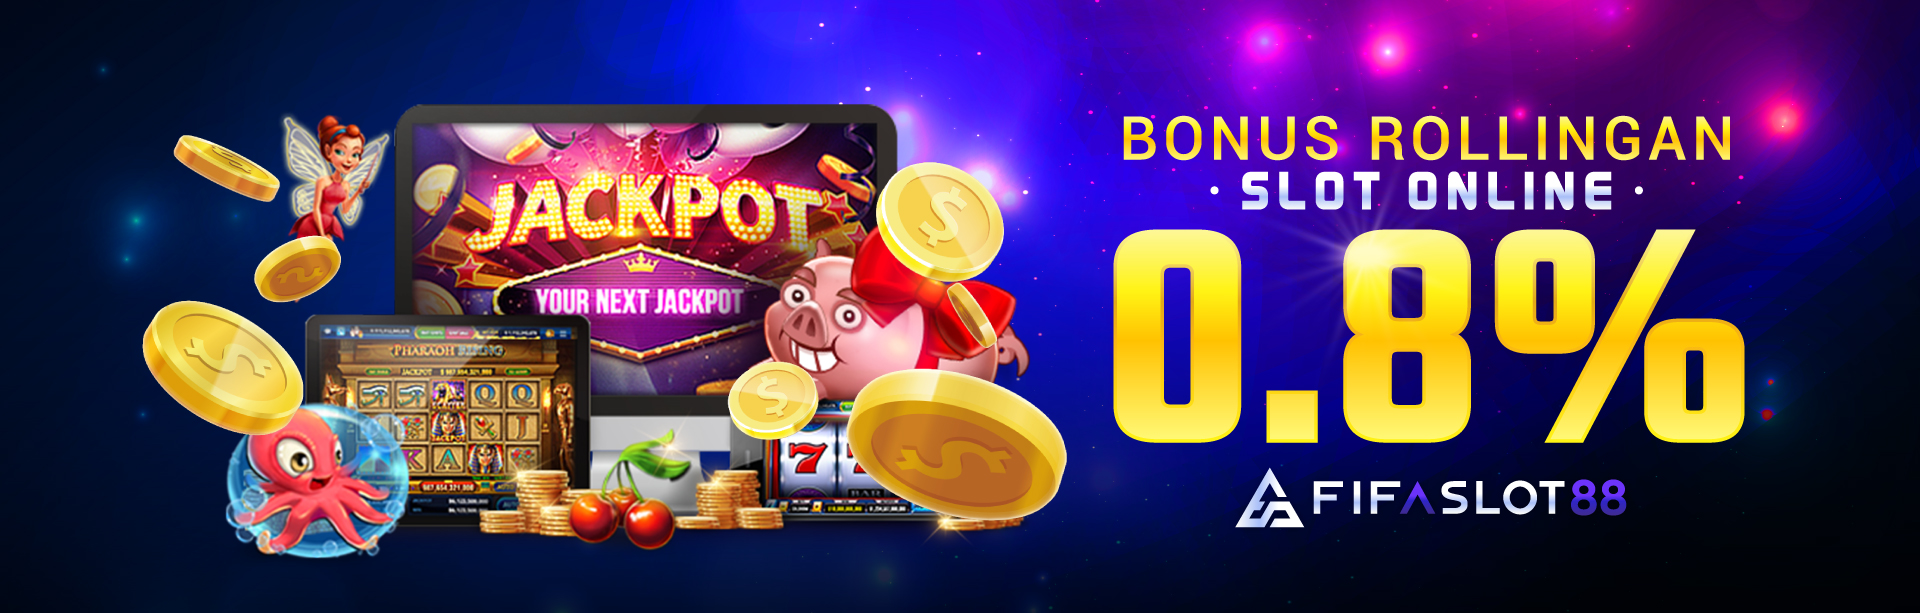 Bonus Rollingan Slot online 0,8%